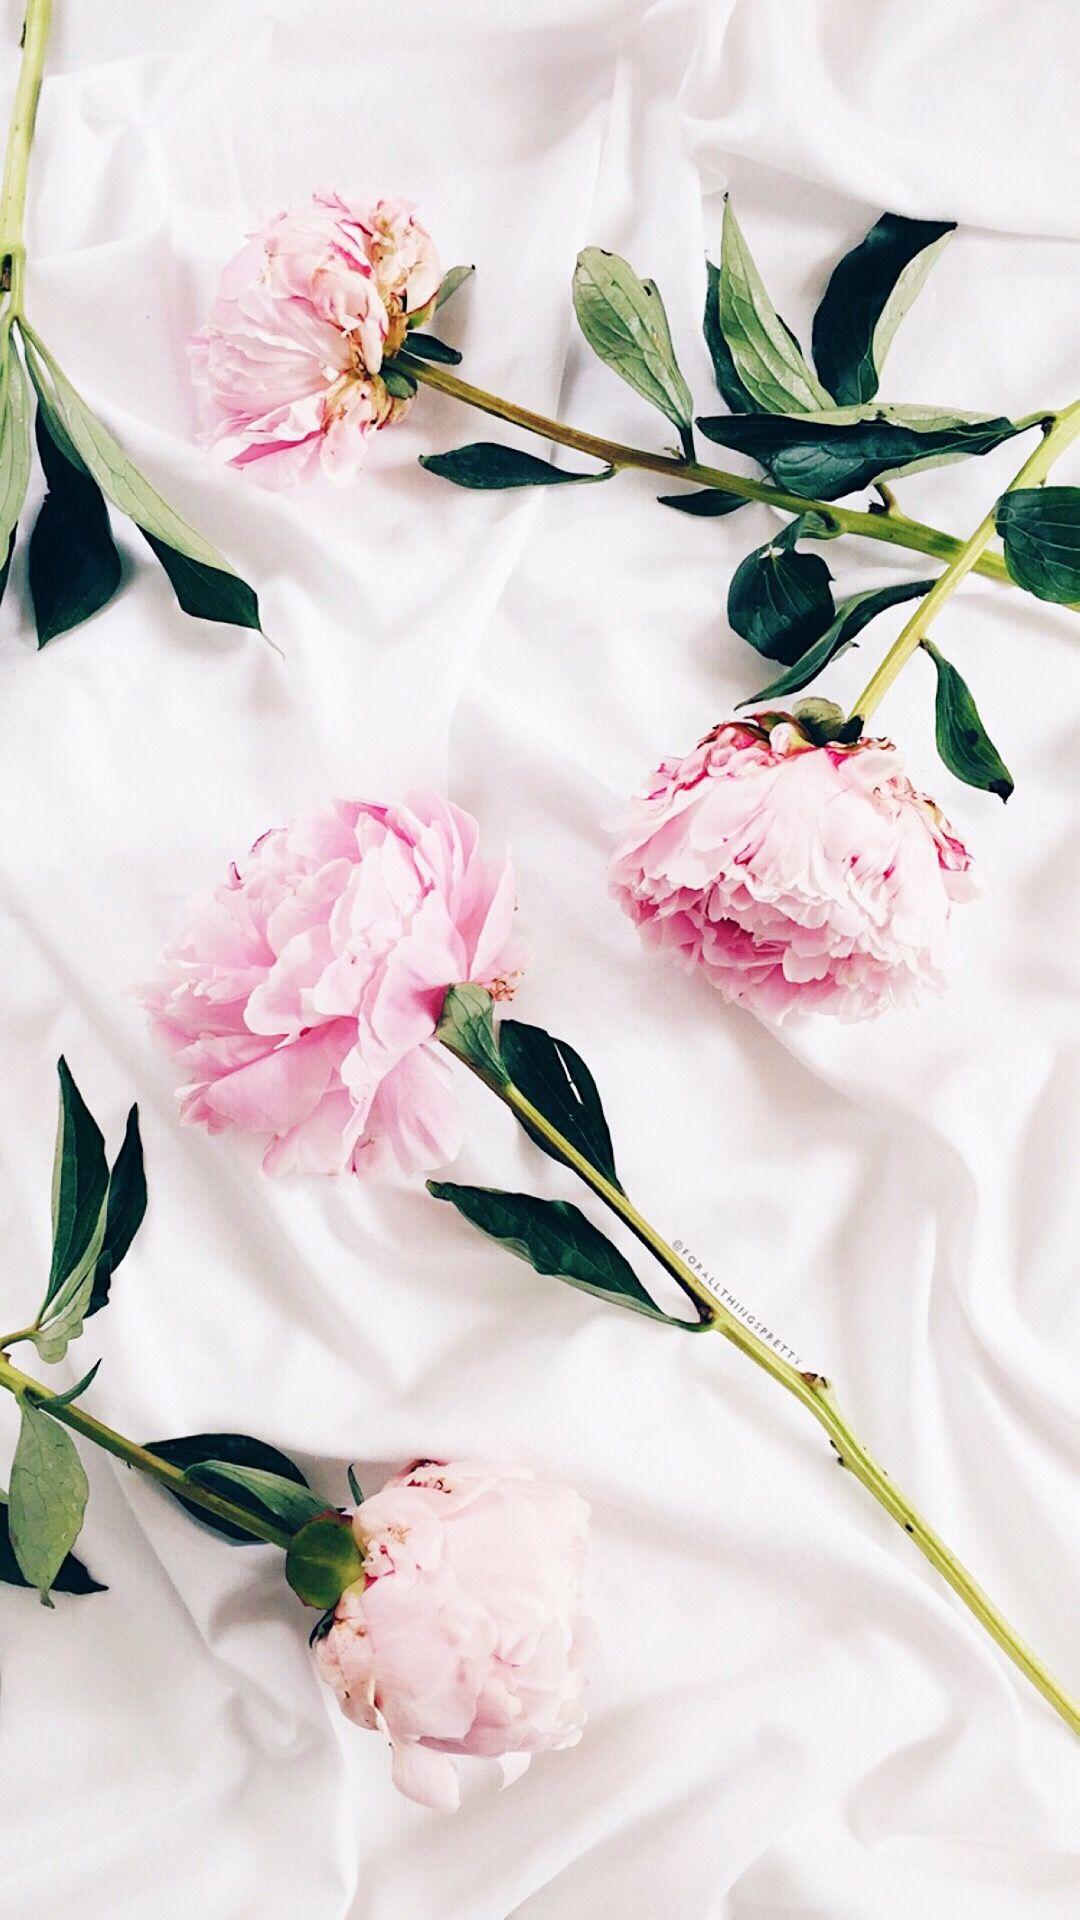 Pink Flowers Iphone Wallpaper Pink Wallpaper Iphone Hipster